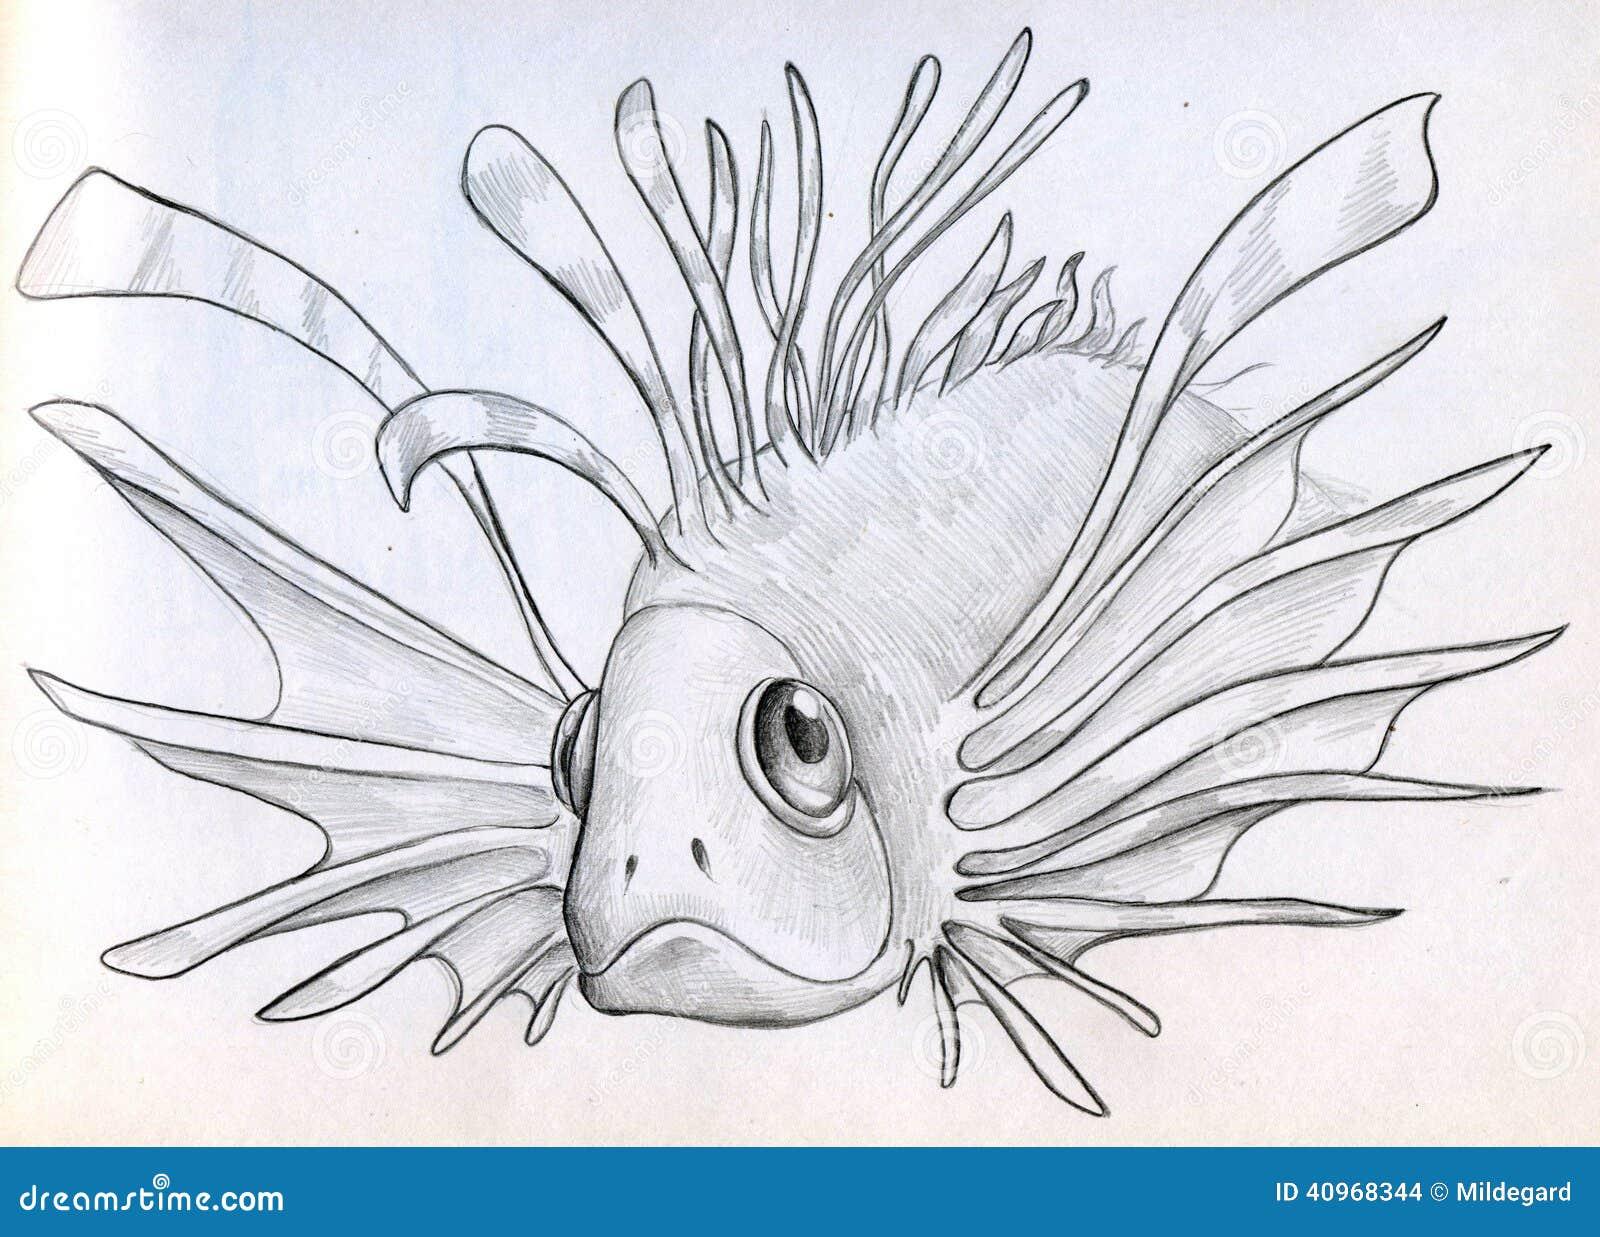 Exotic poisonous fish sketch